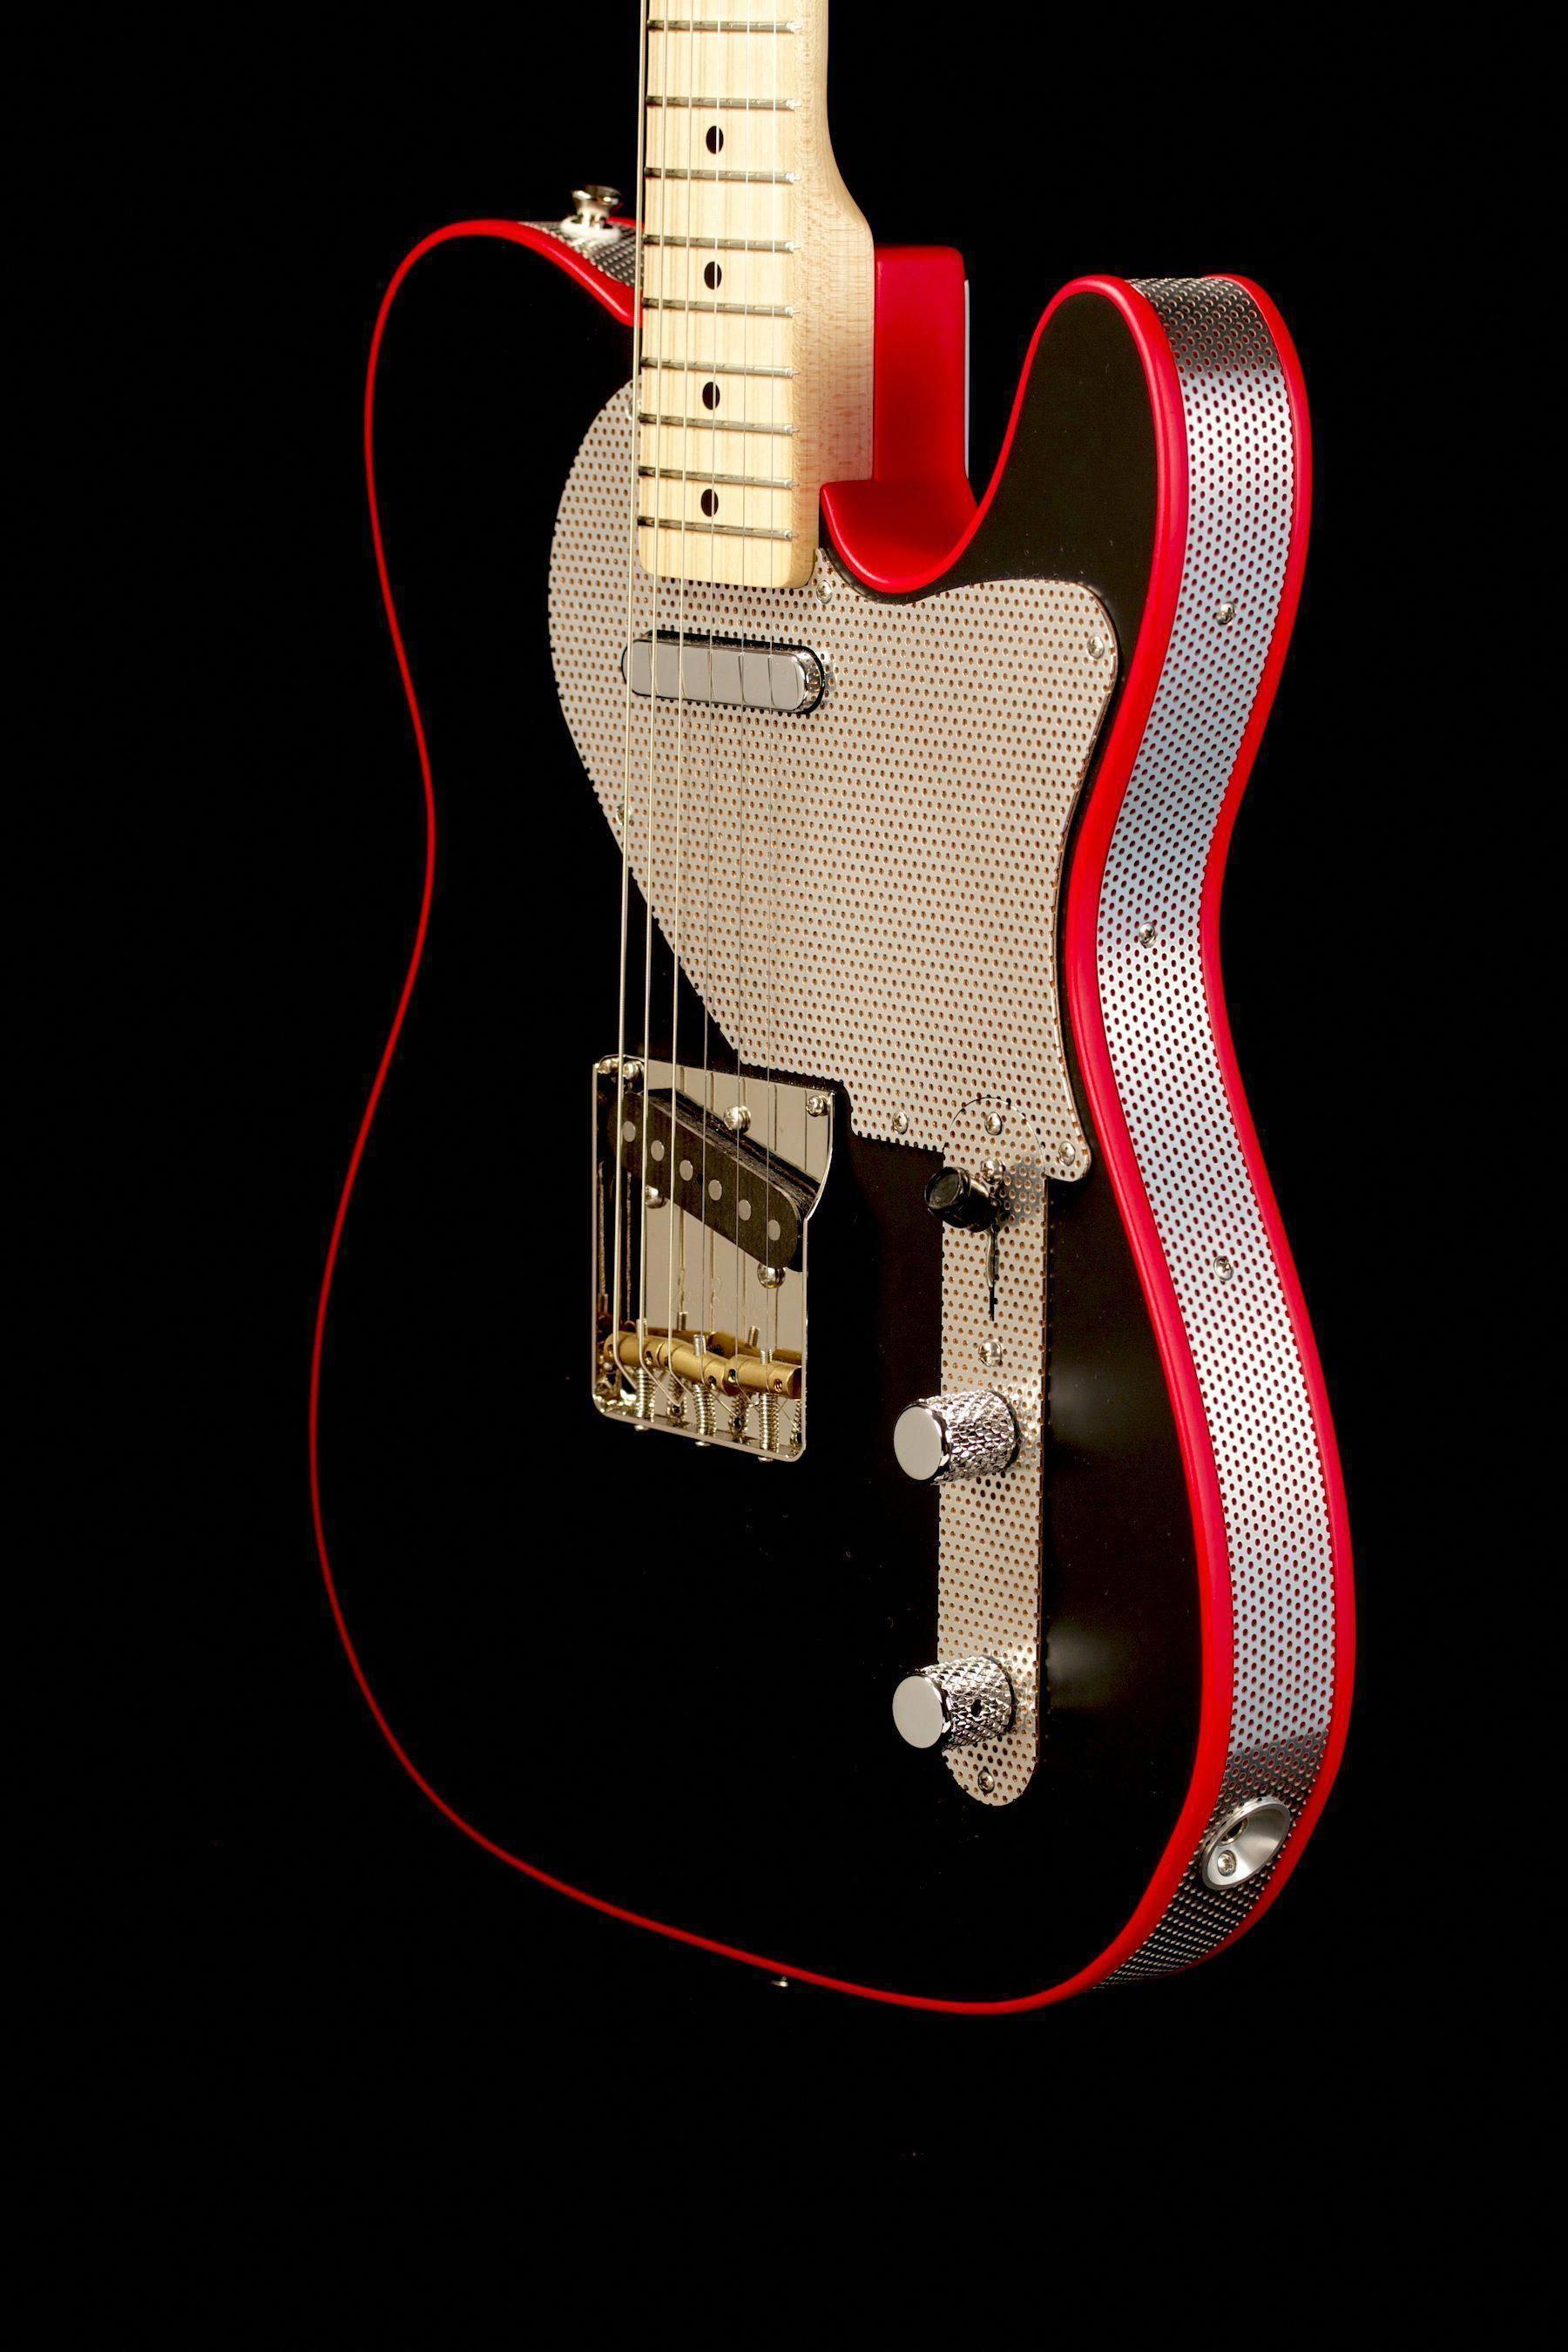 Electric Guitar Volume Pot Electric Guitar Nut Files Guitarshow Guitarlover Electricguitar Fender Guitars Guitar Acoustic Guitar